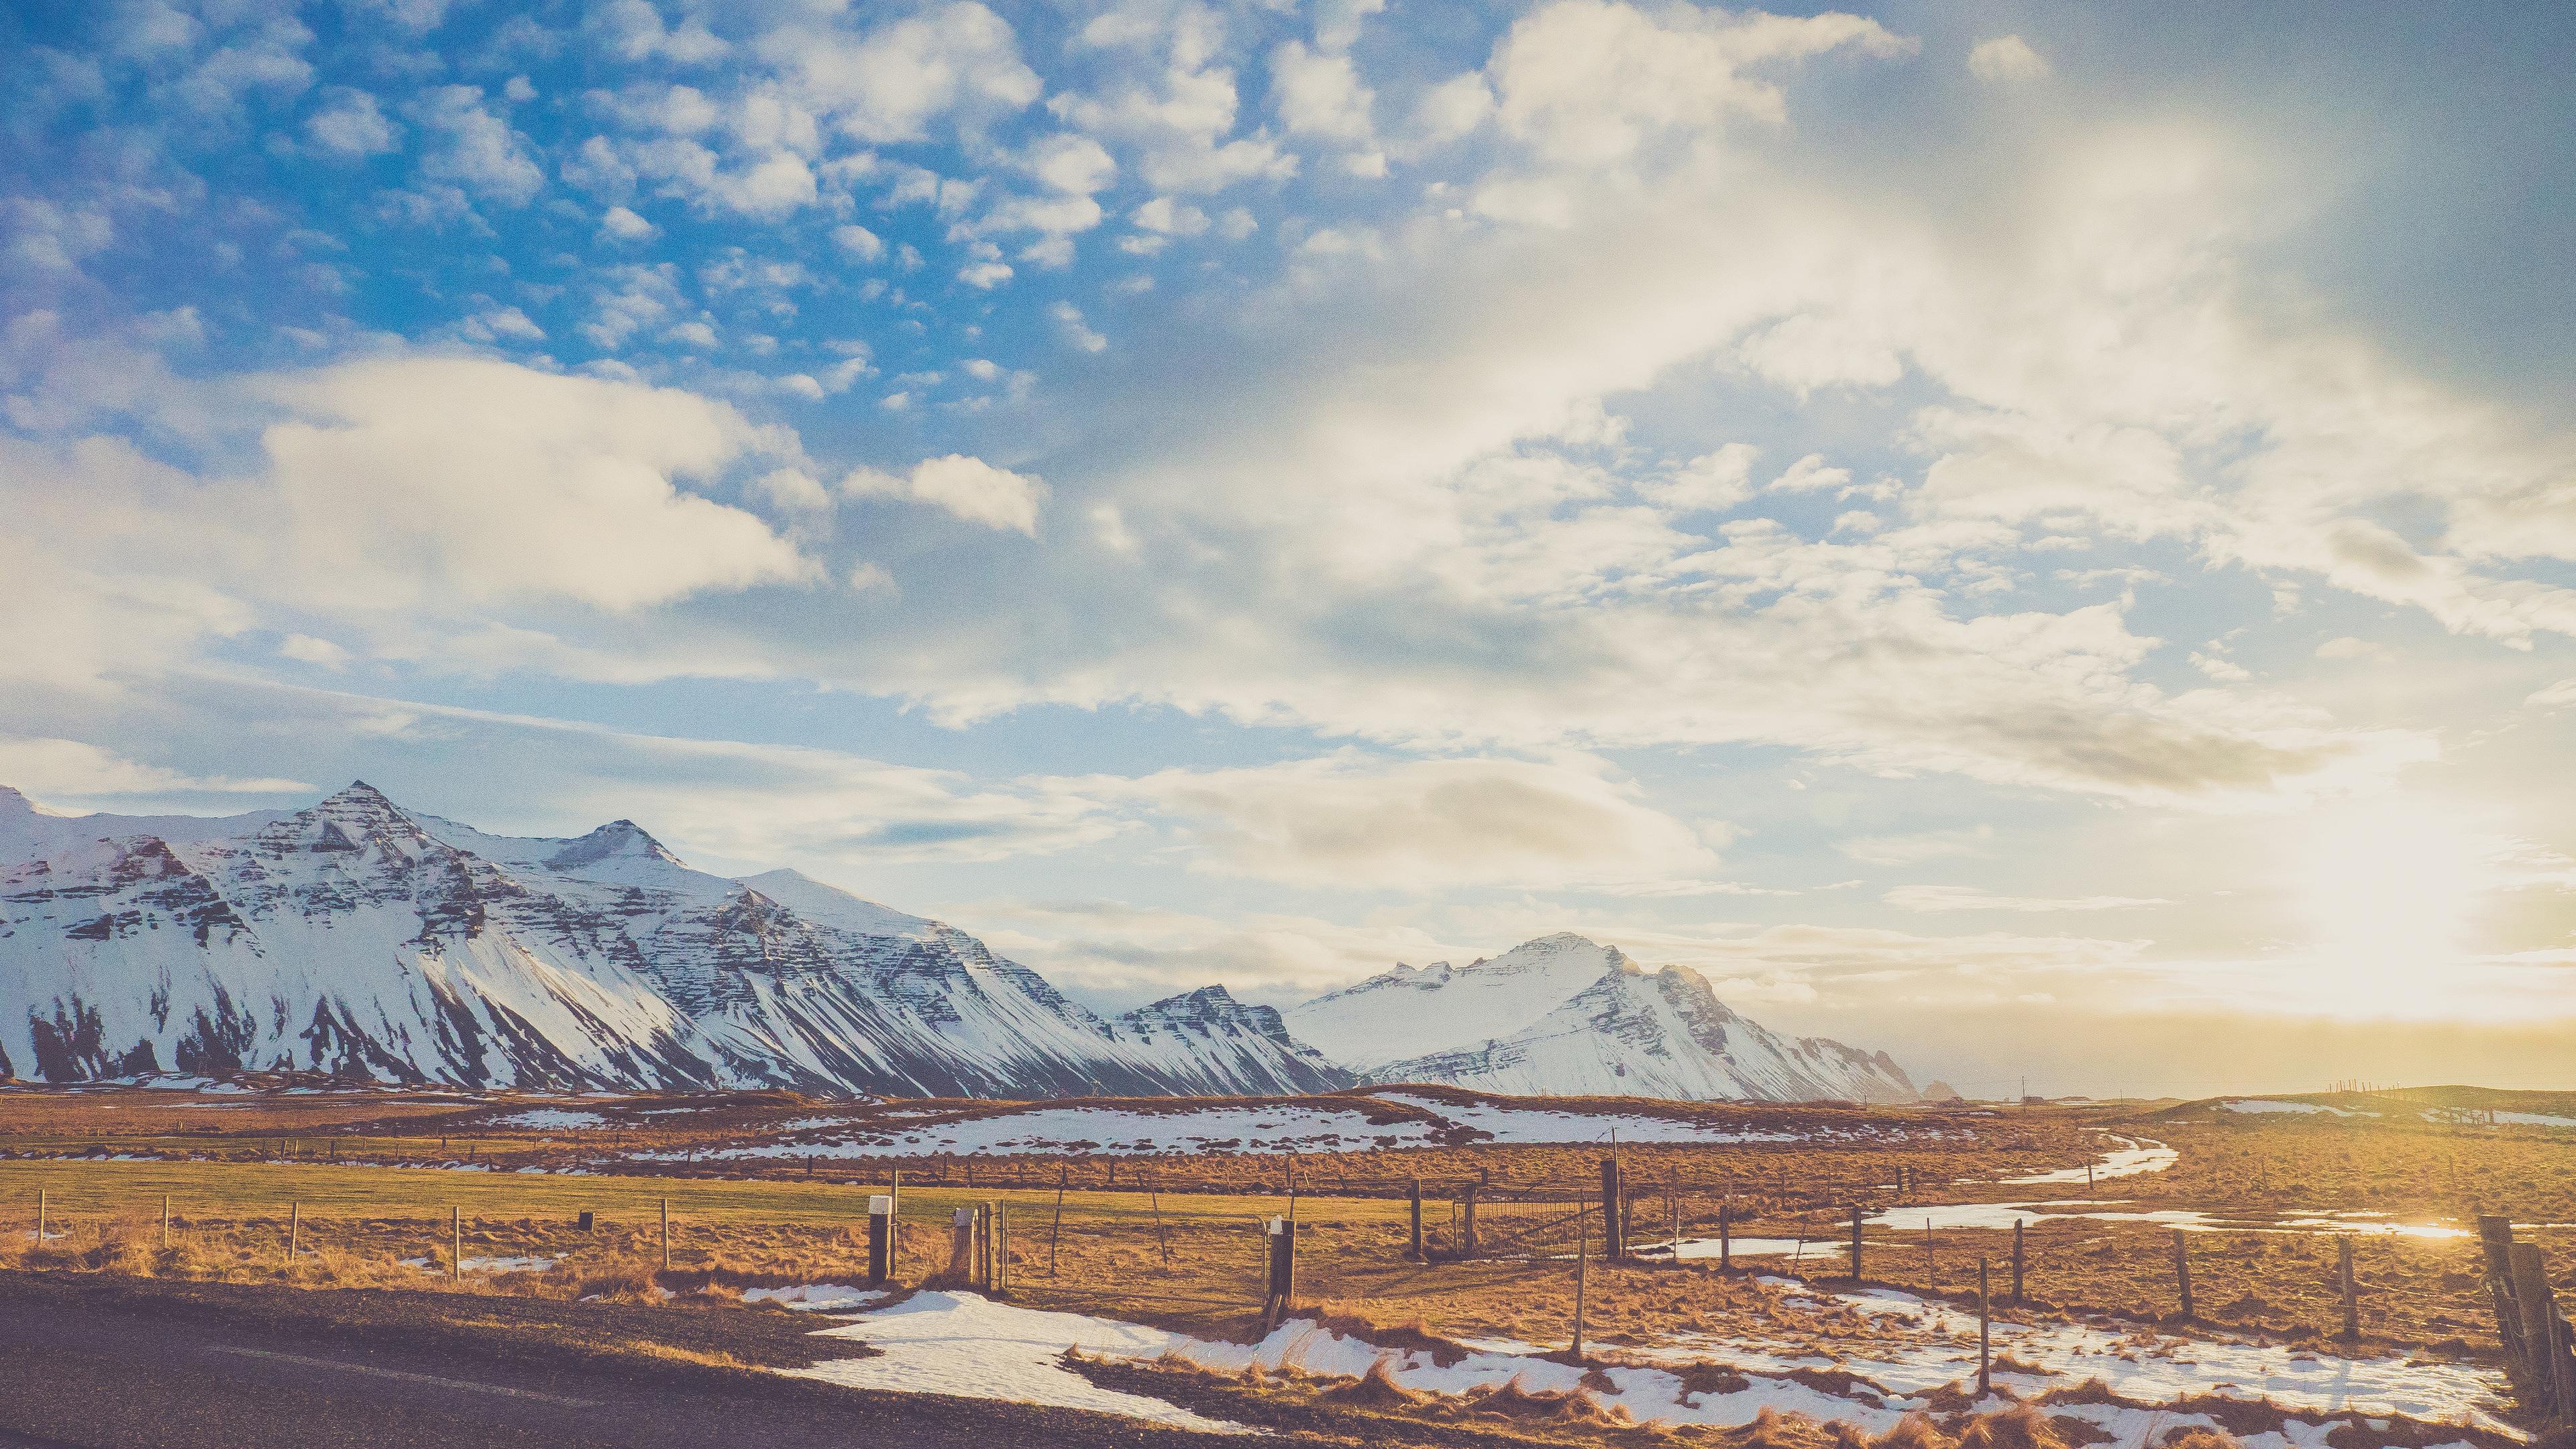 daylight risen sun snowy mountains road 4k 1540136351 - Daylight Risen Sun Snowy Mountains Road 4k - snow wallpapers, road wallpapers, photography wallpapers, nature wallpapers, mountains wallpapers, hd-wallpapers, 4k-wallpapers